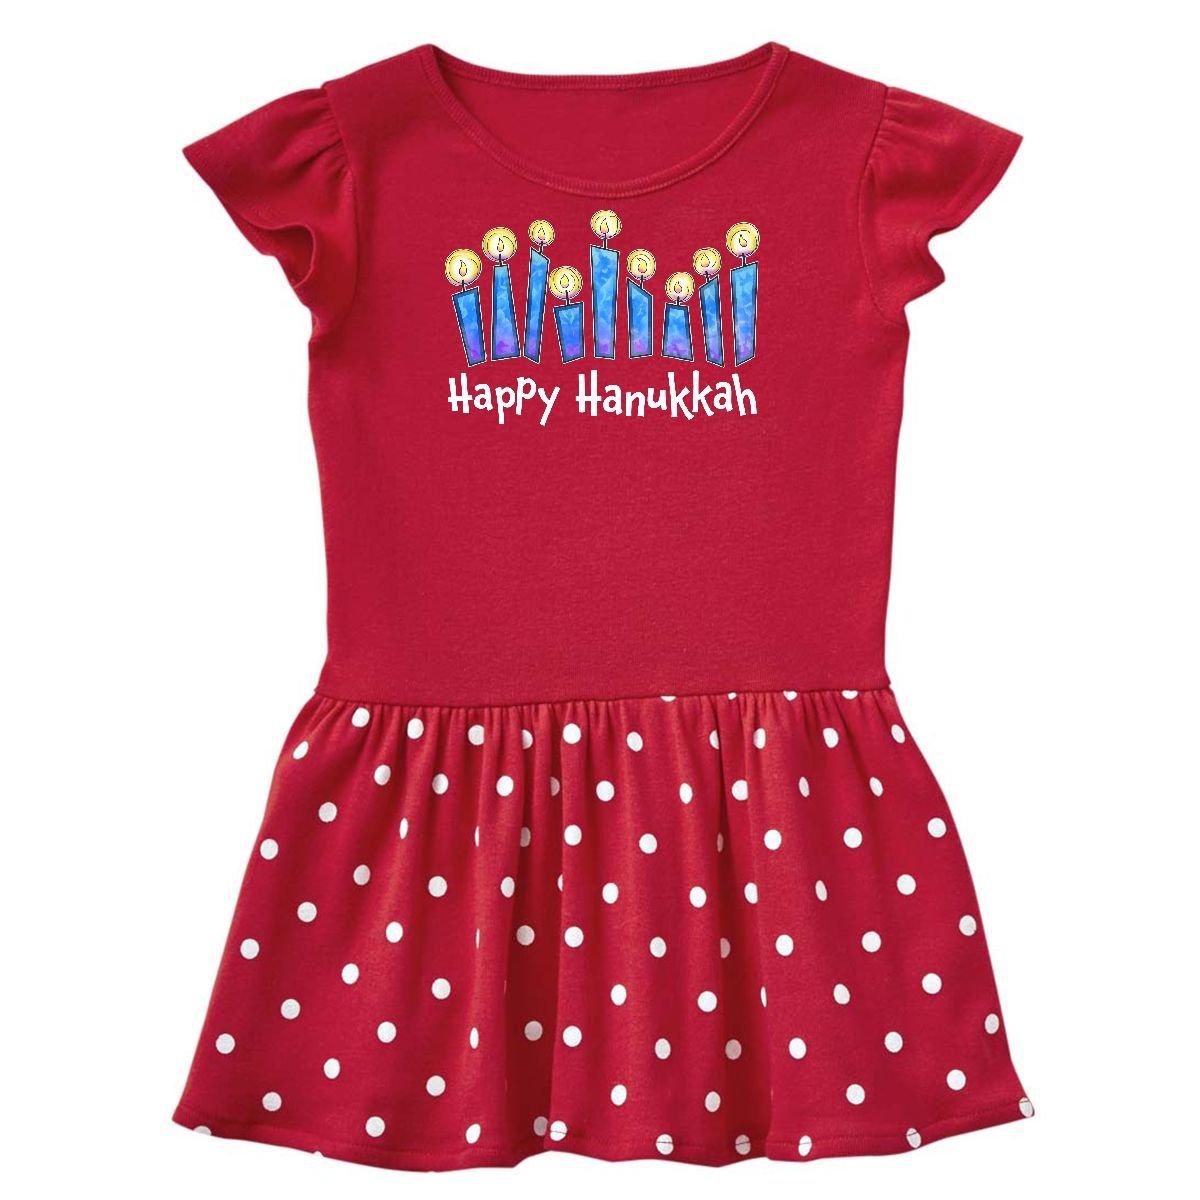 inktastic - Happy Hanukkah lit Candles Toddler Dress 14-186499-198